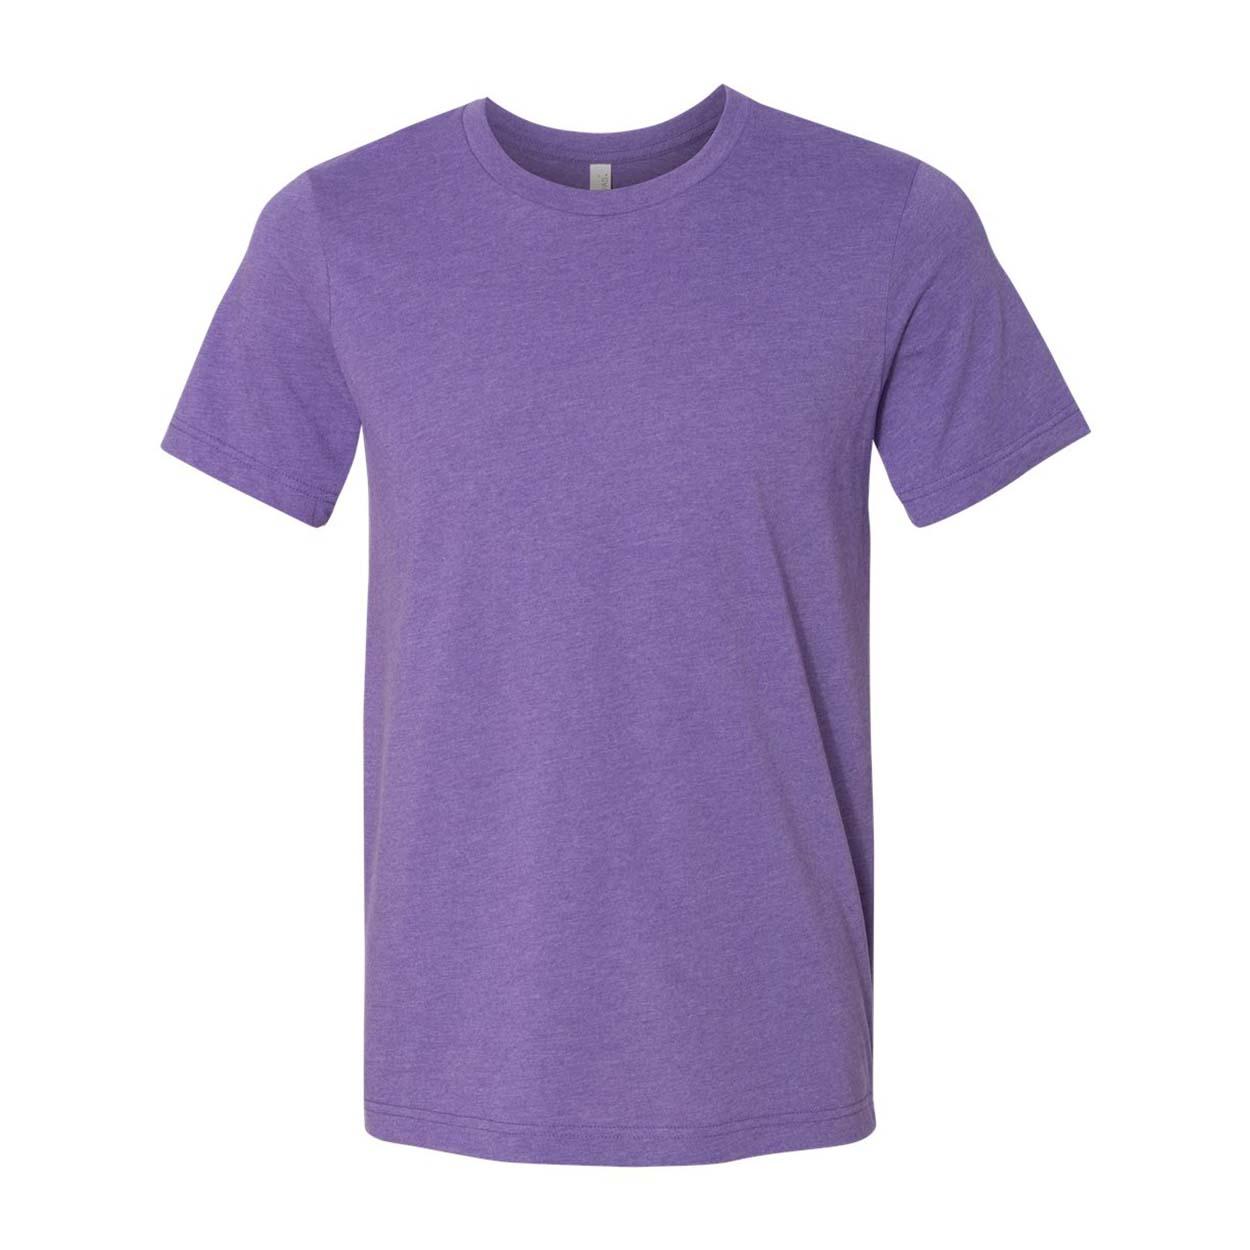 Purple heather jersey